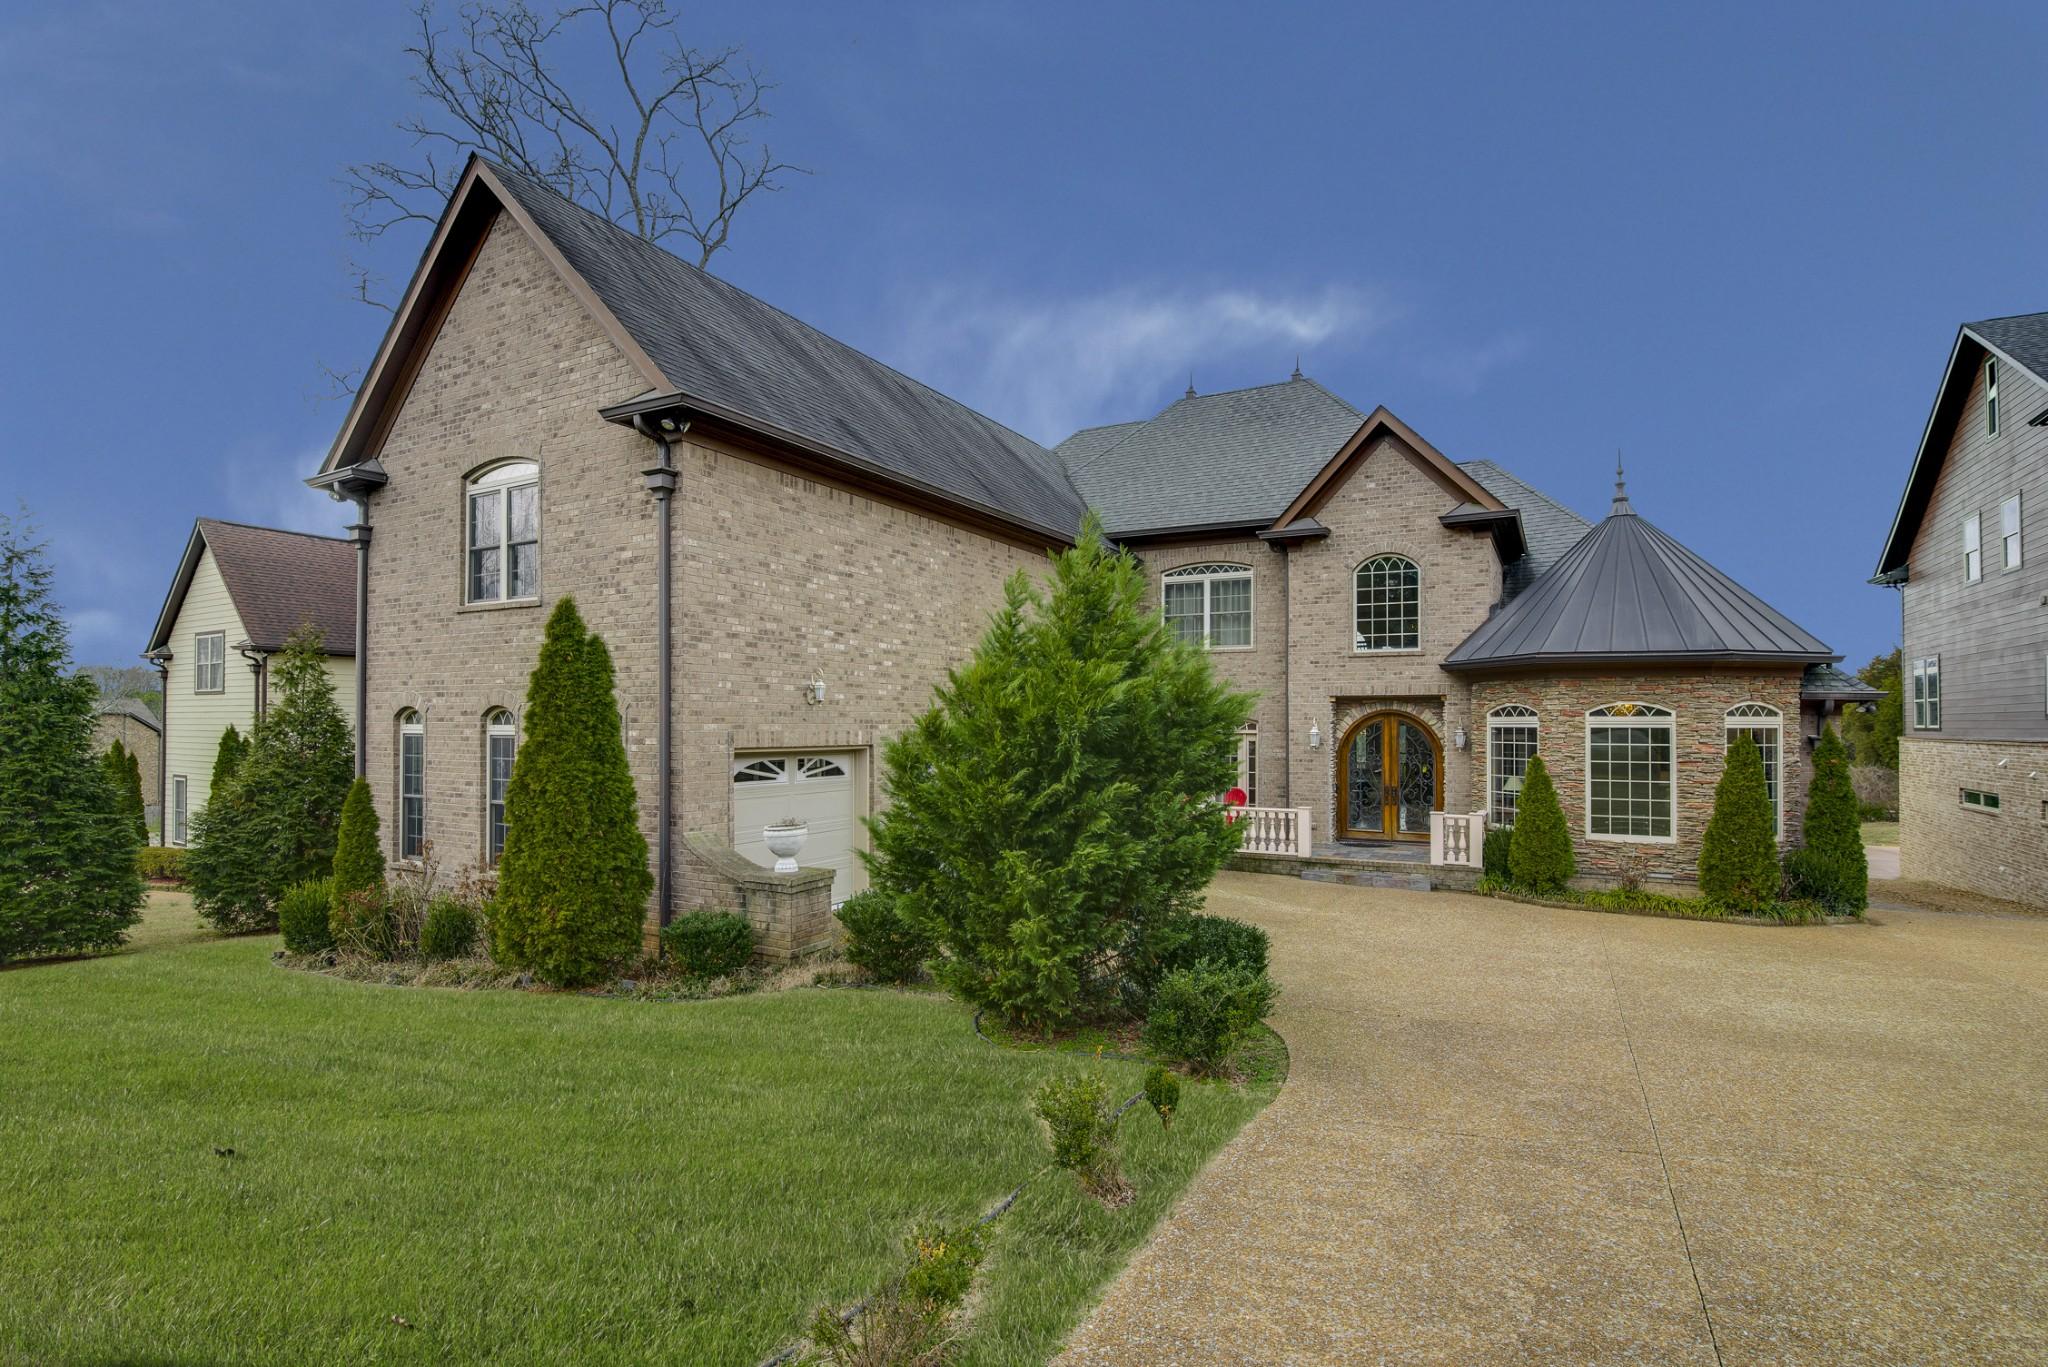 6125 Mount Pisgah Rd, Nashville, TN 37211 - Nashville, TN real estate listing